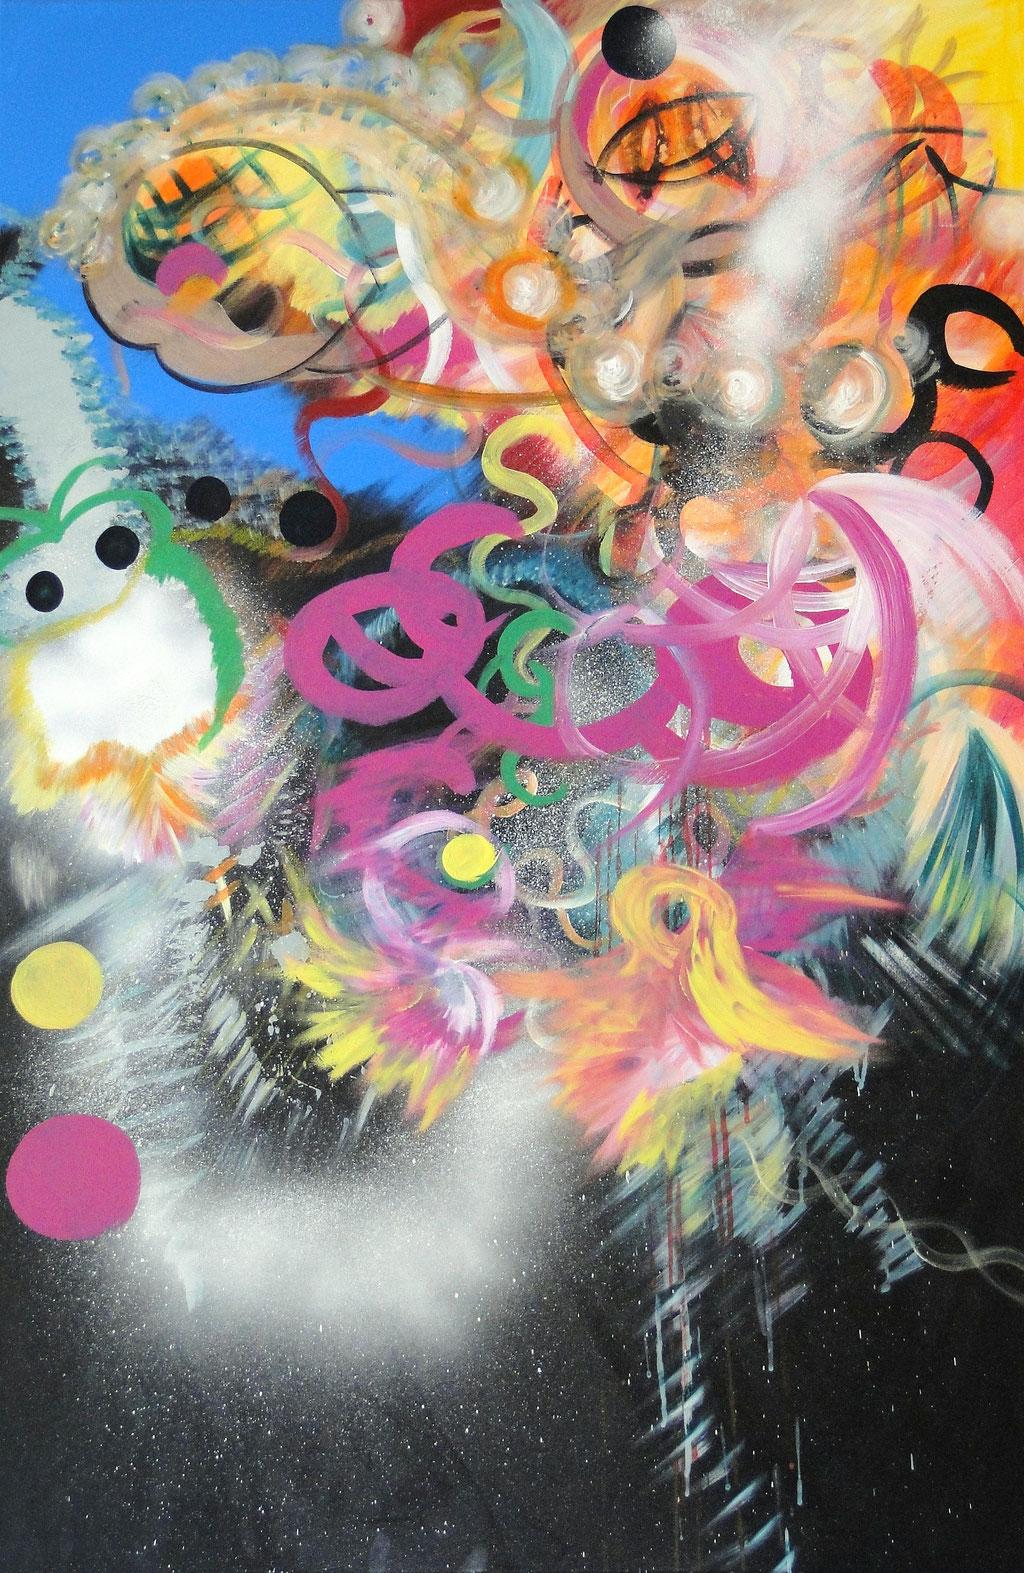 magic dreams    120 cm x 80 cm